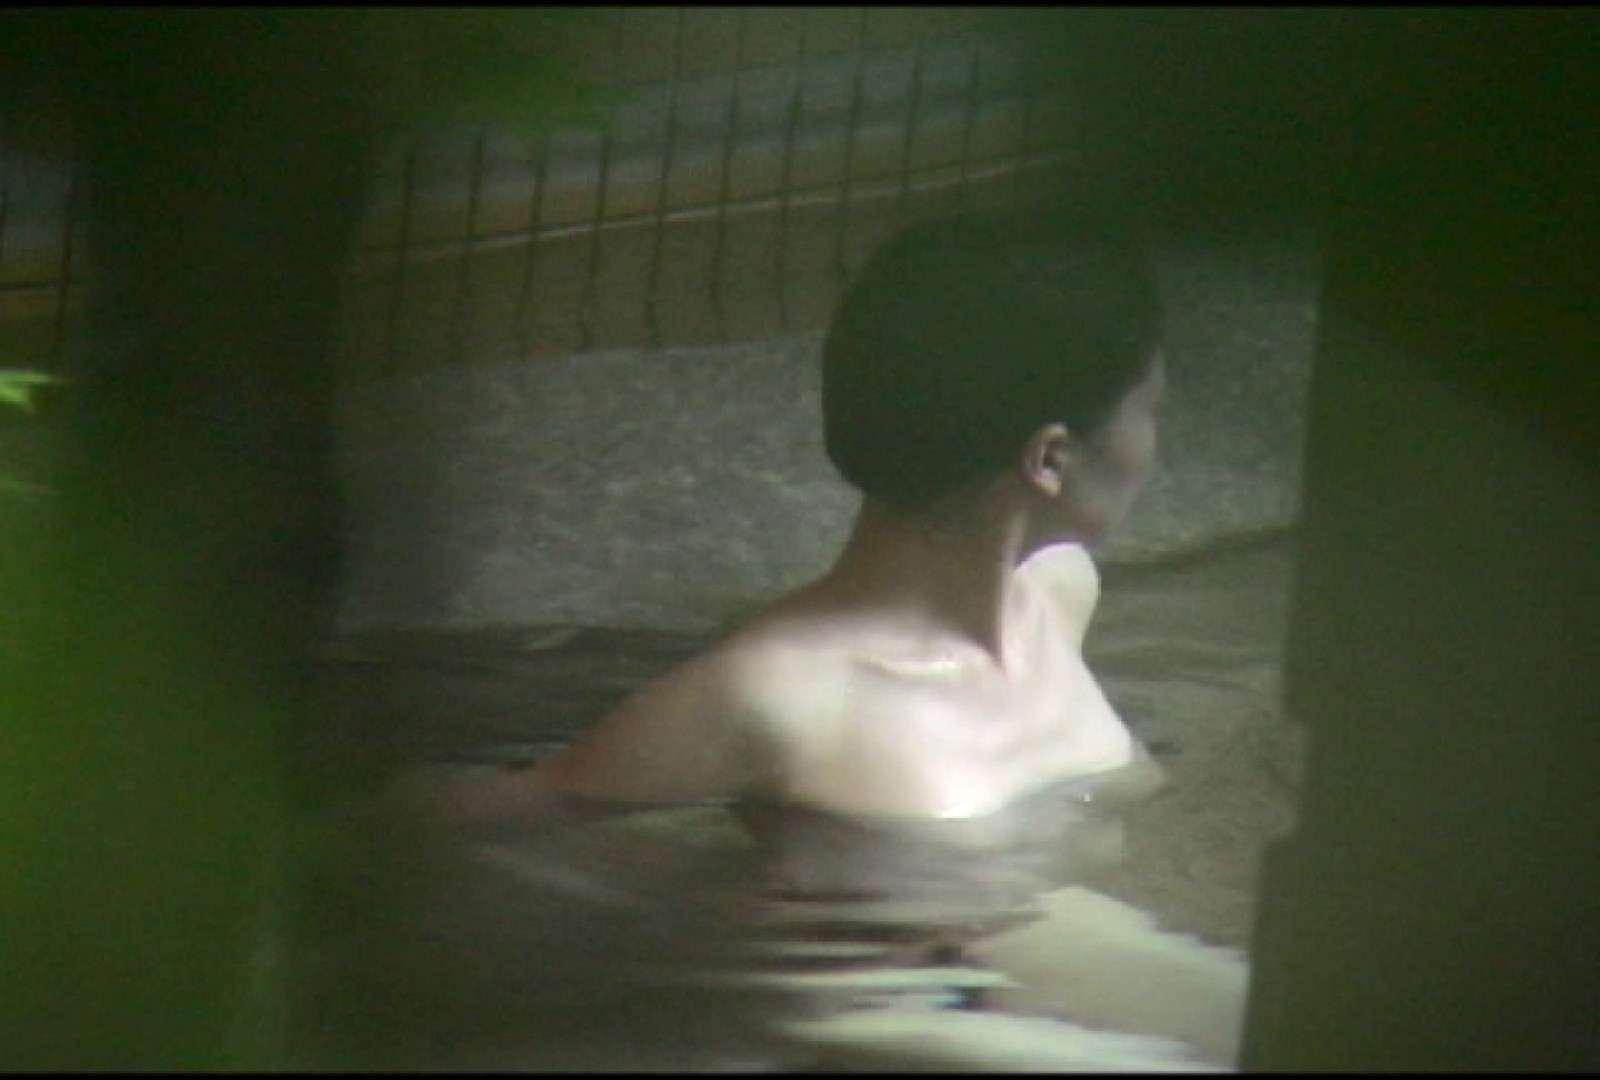 Aquaな露天風呂Vol.699 露天風呂 | OLのエロ生活  104連発 31